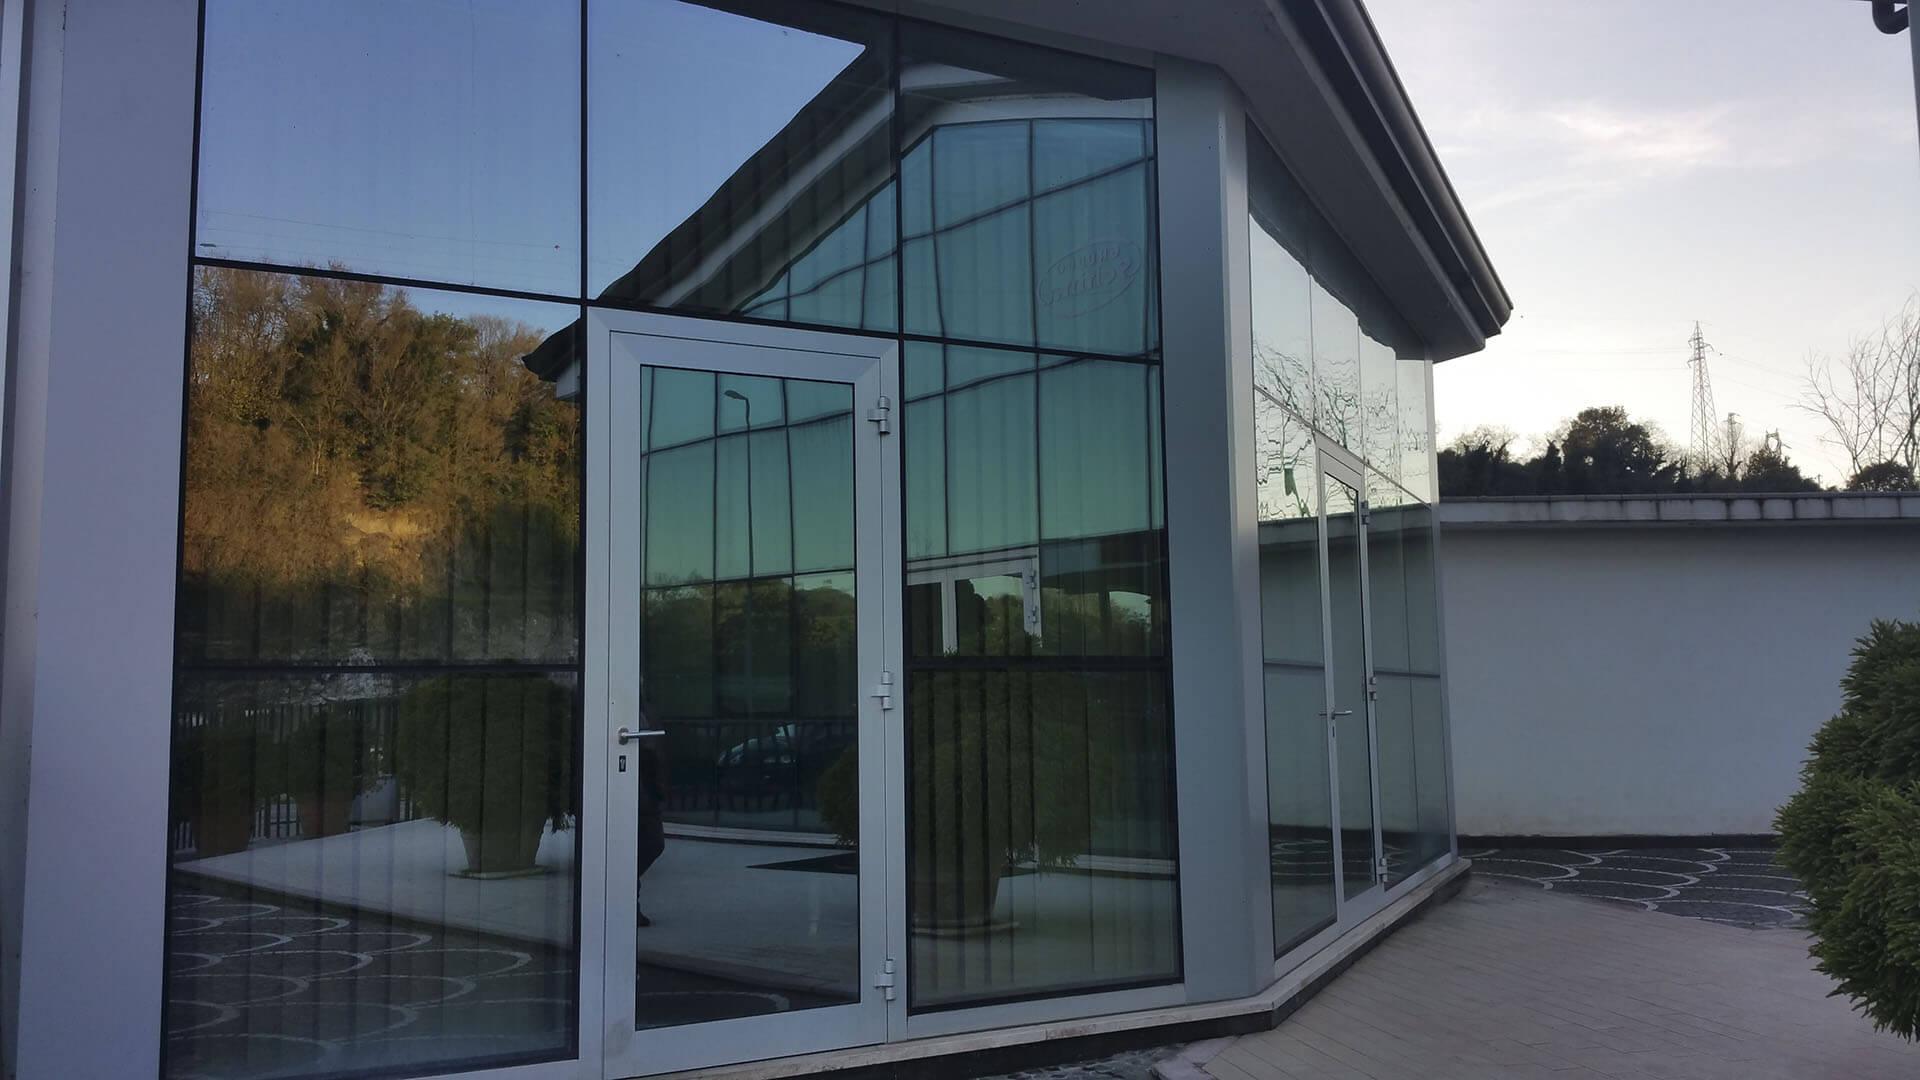 Pulizia vetri finestre - Pulizia vetri finestre ...